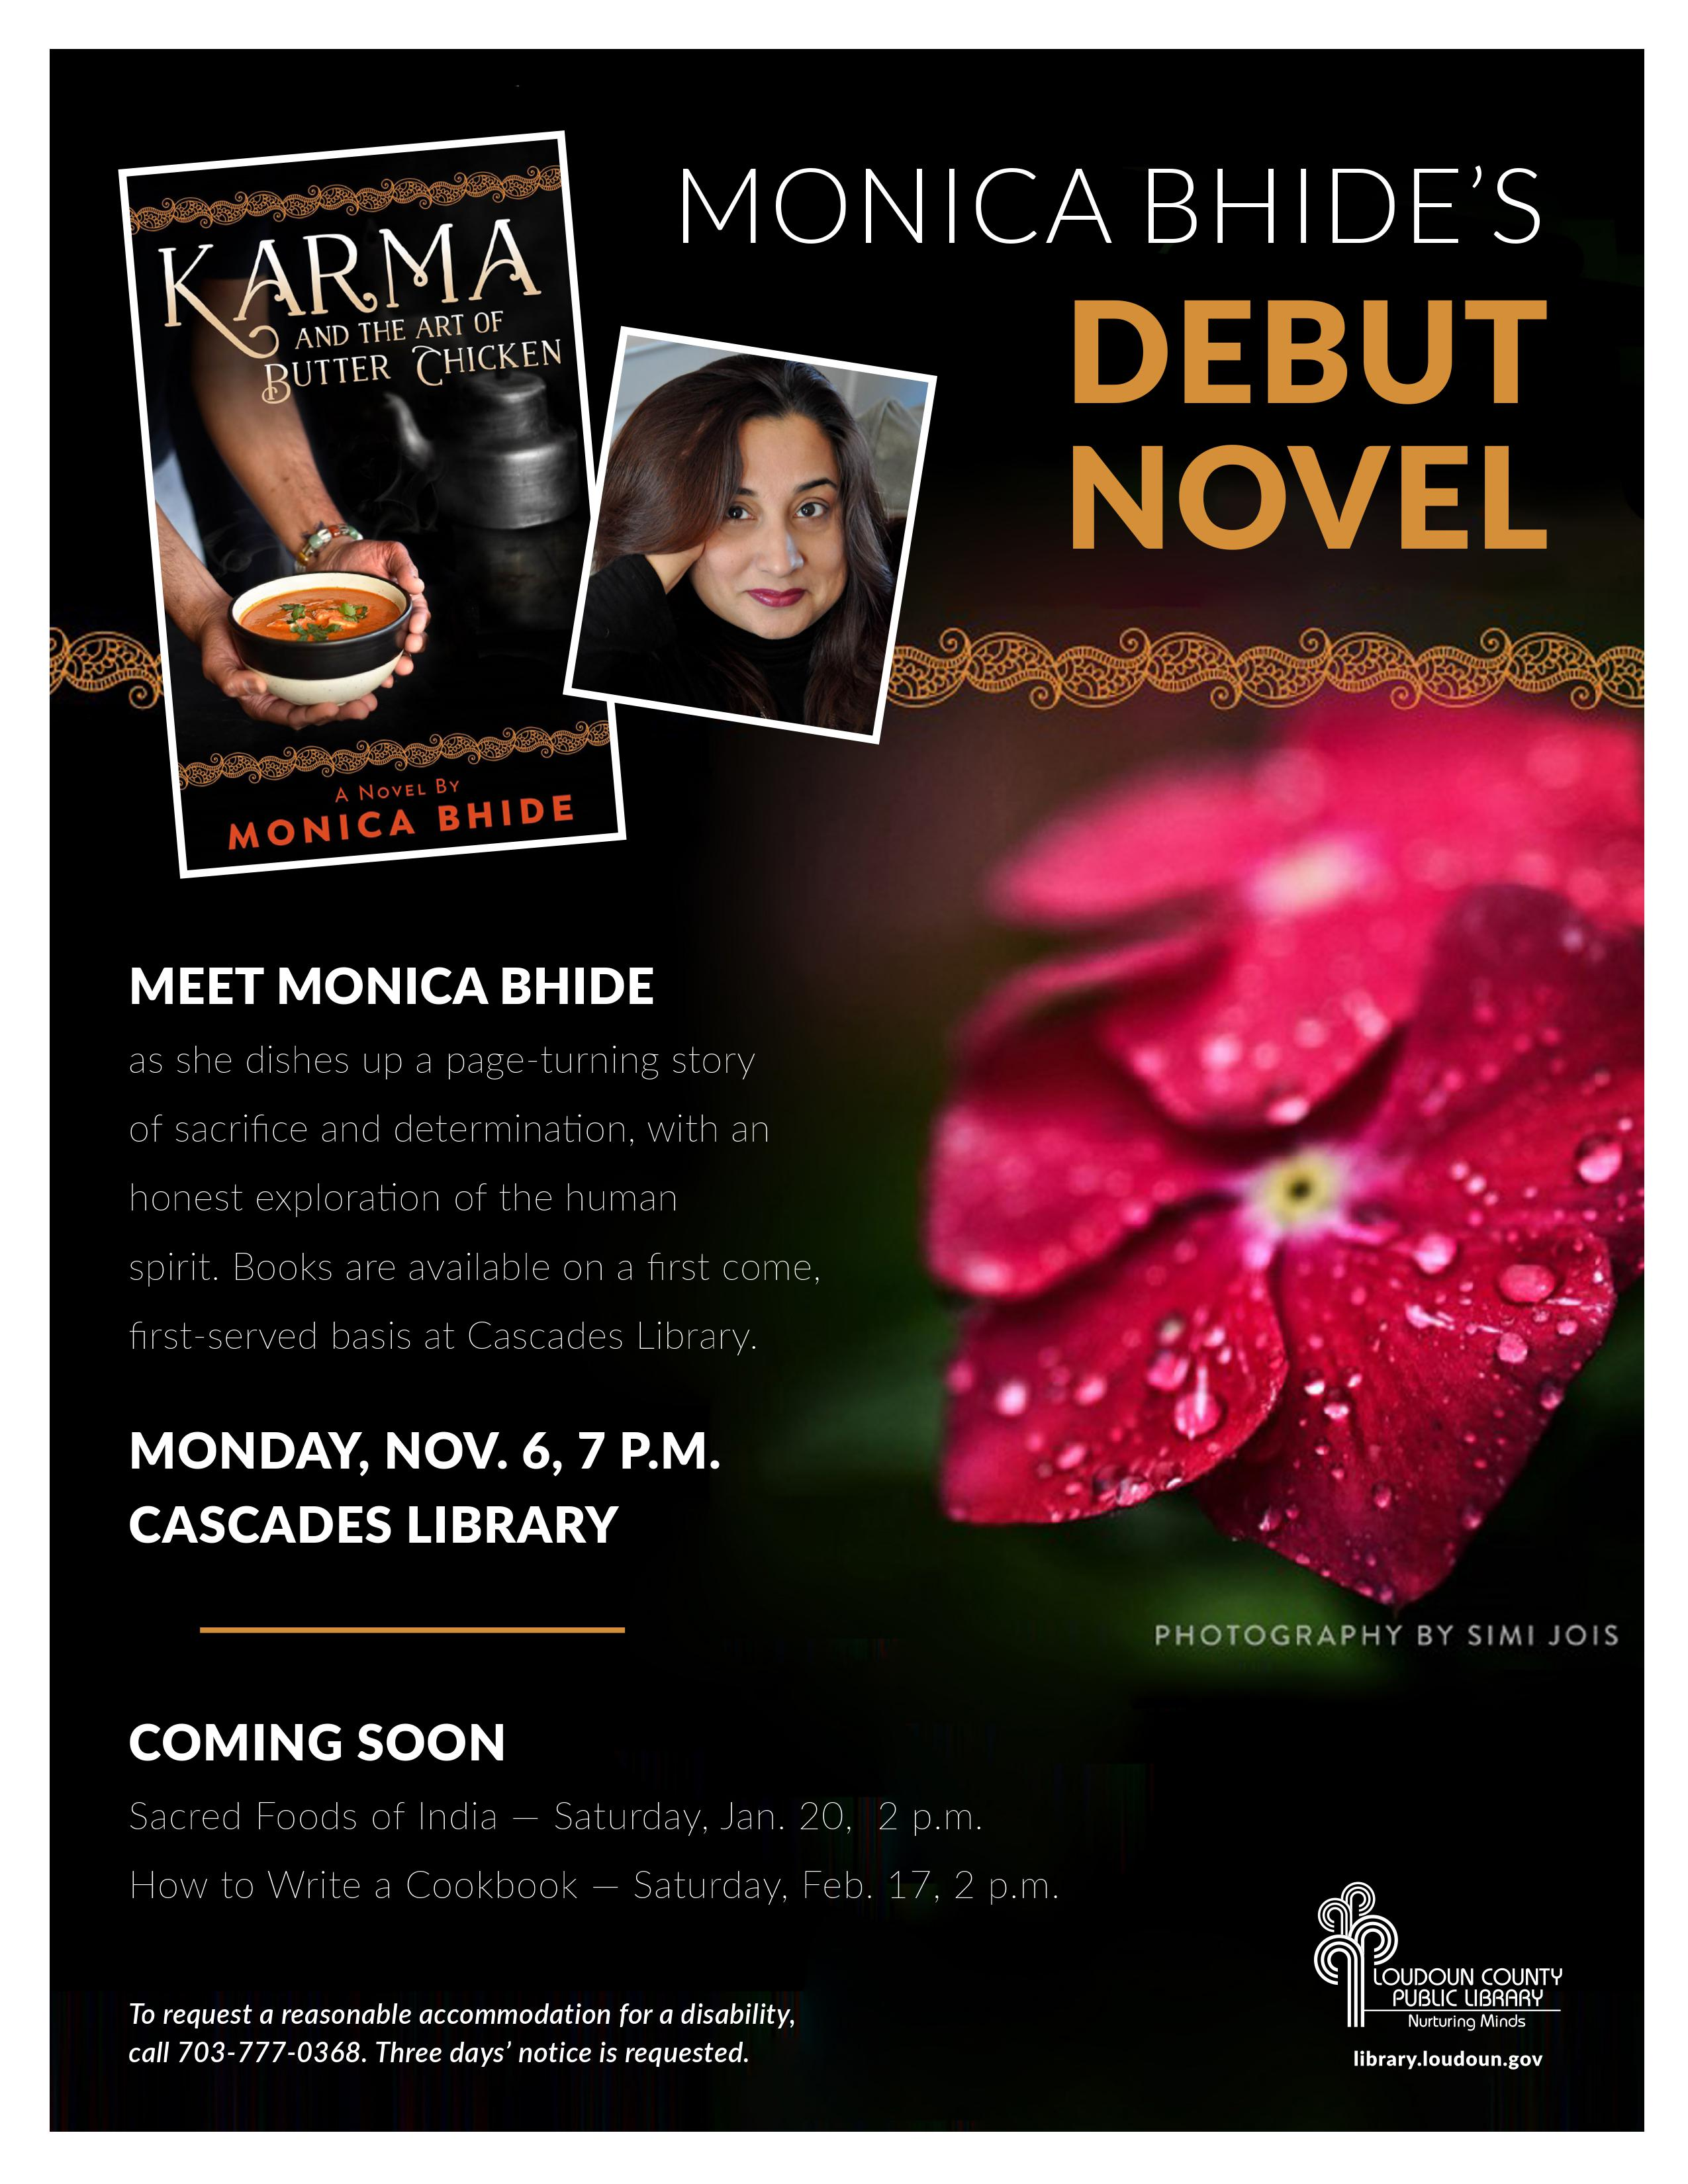 Cascades Library Event ~ November 6, 2017